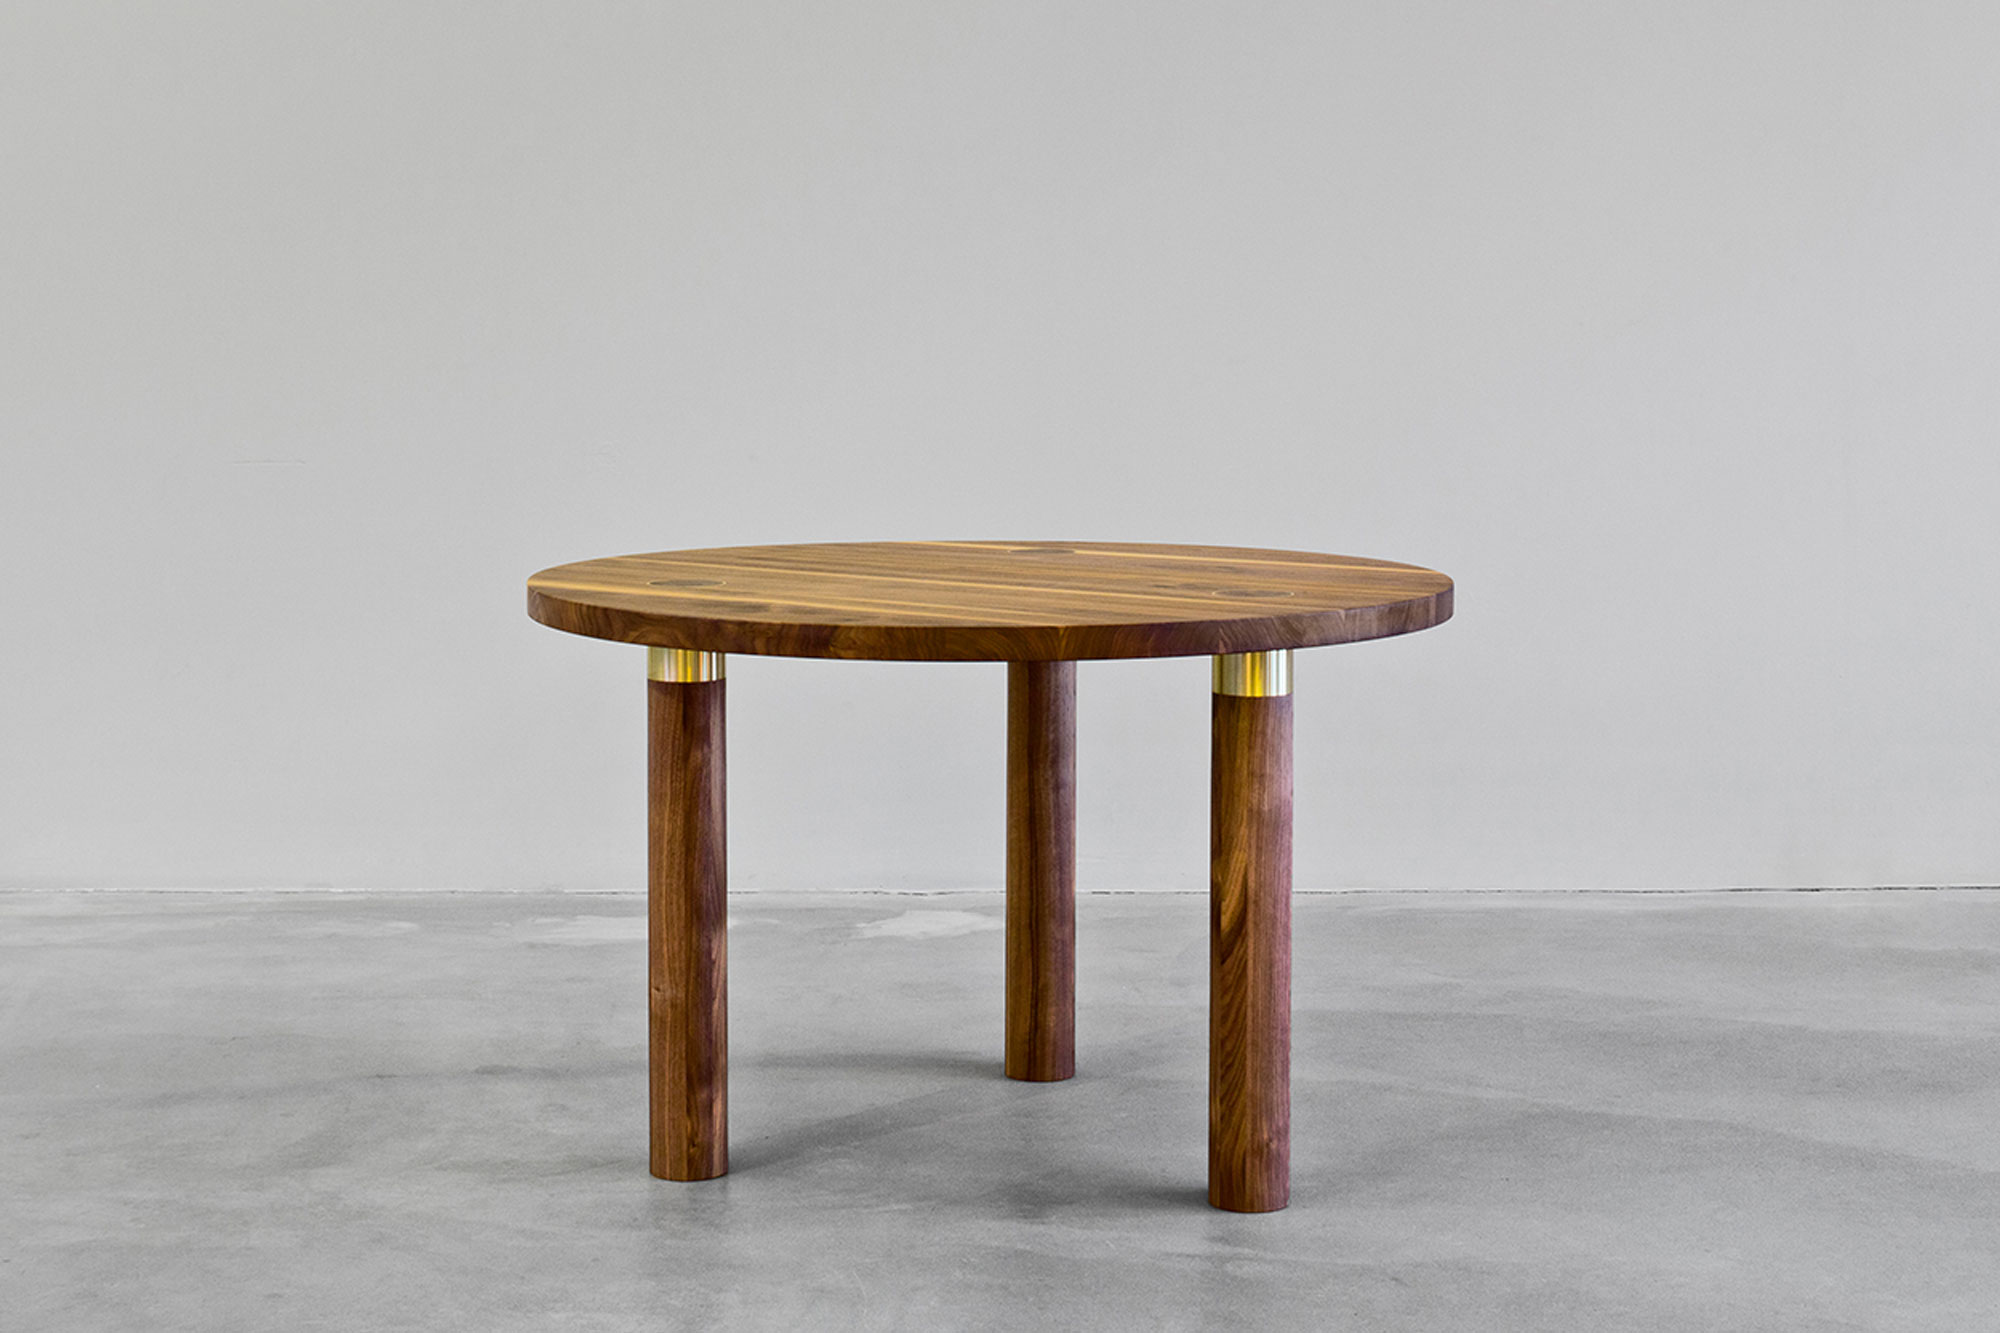 morgen-kollektion-pole-table-6